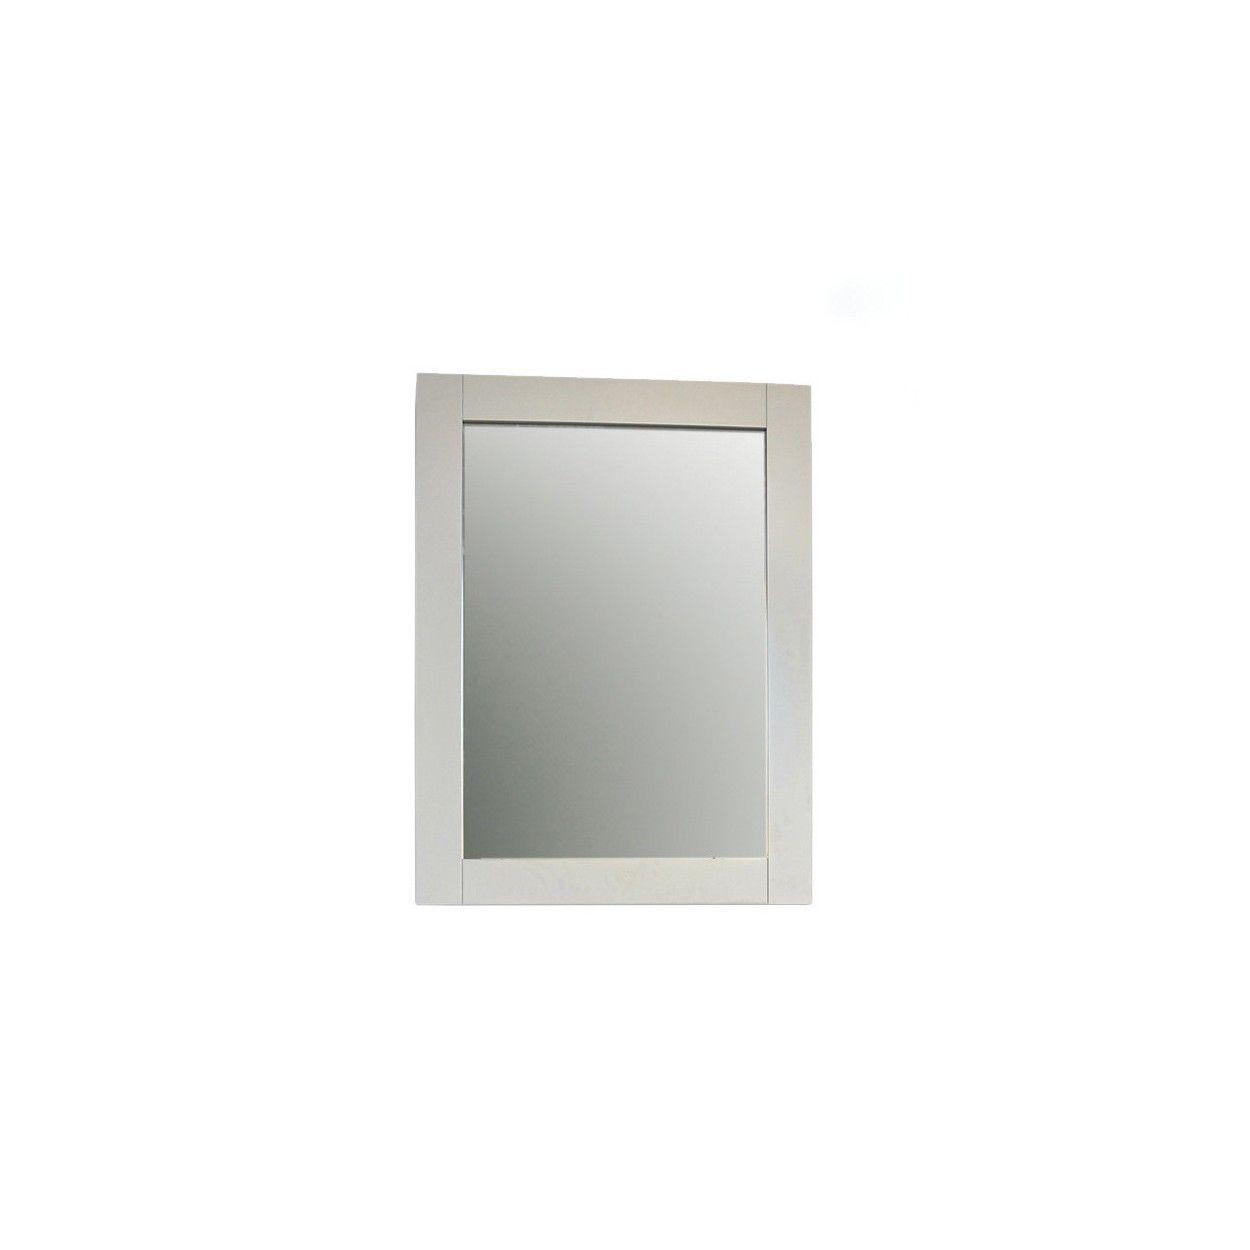 Espejo de pared color blanco elegante para entrada england - Espejos para pared ...